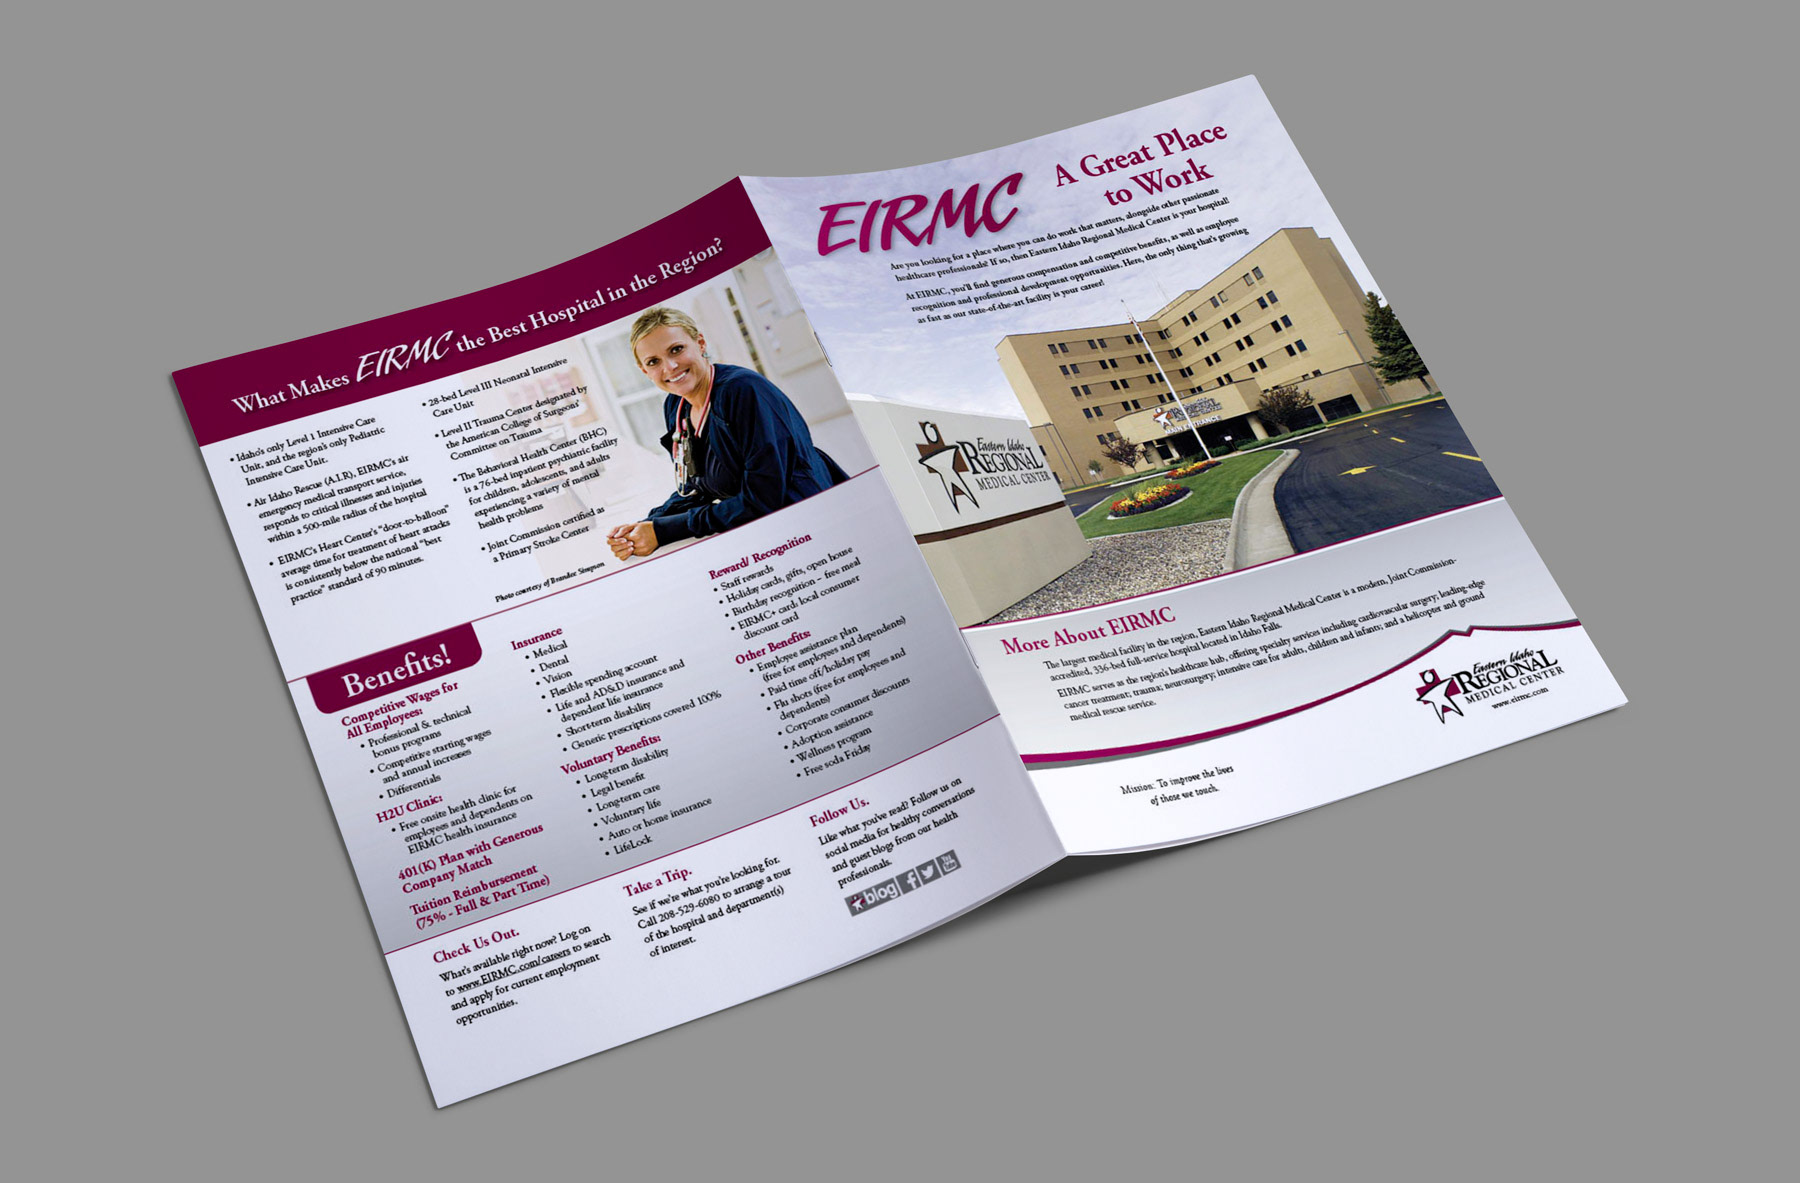 karen hall eirmc recruitment brochures